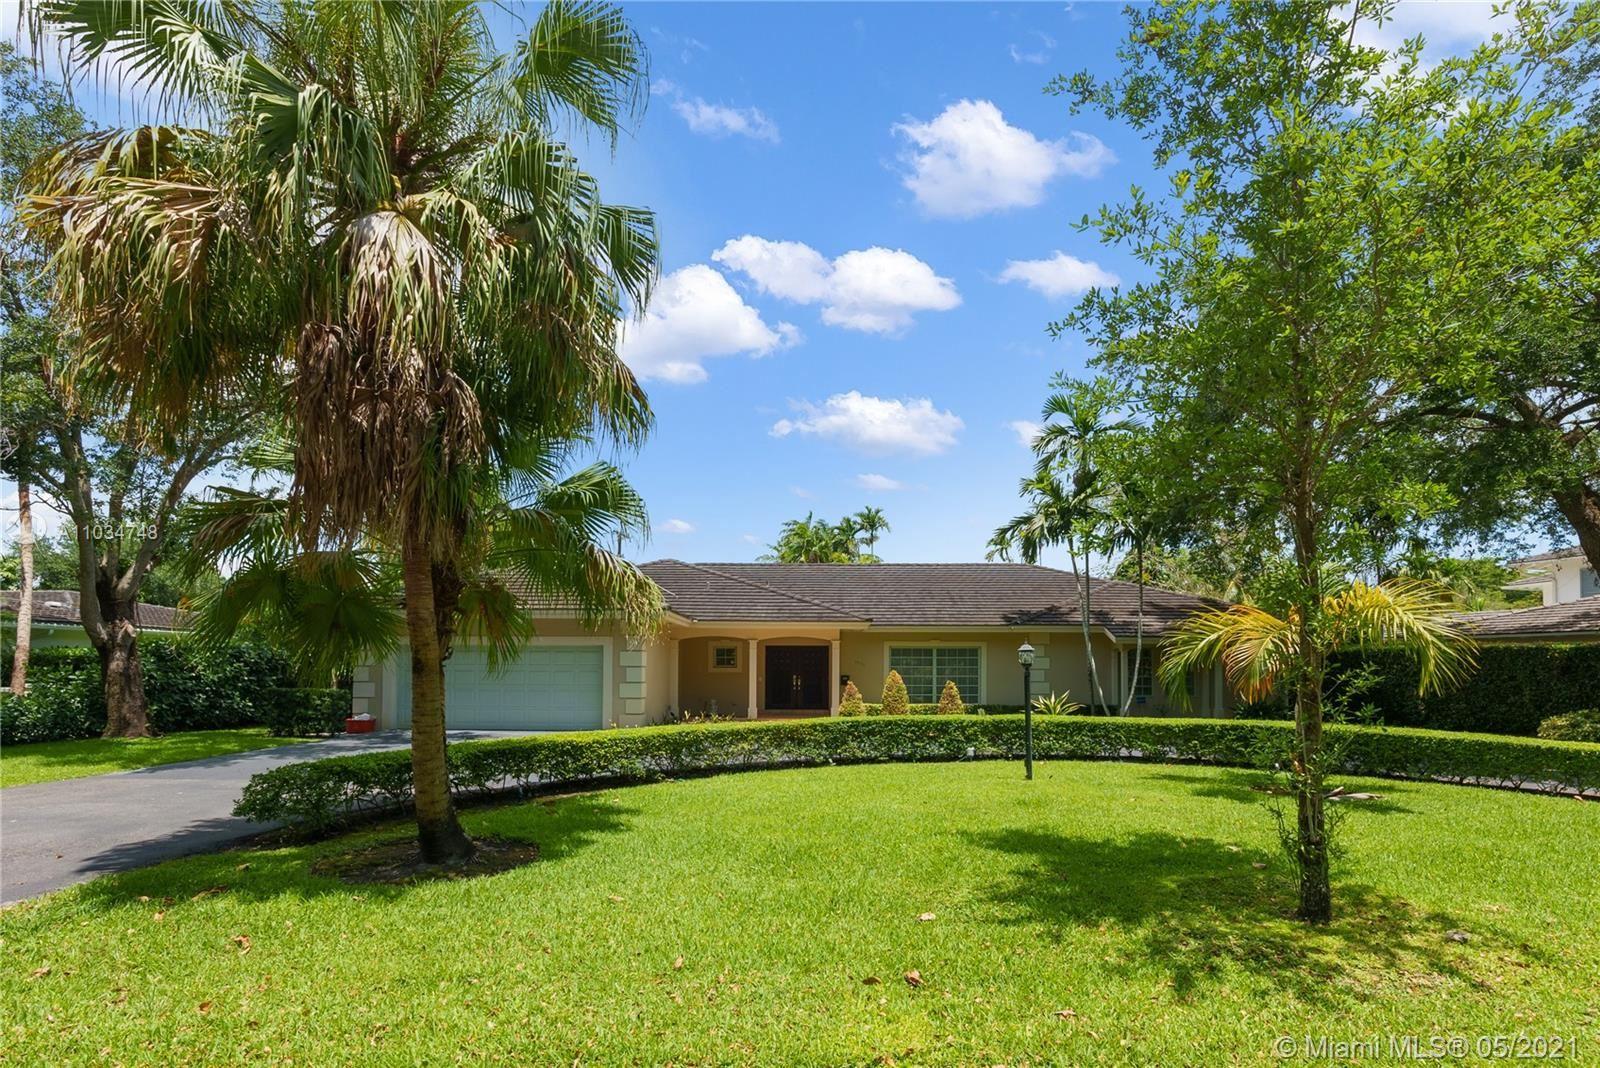 1515 Salvatierra Dr, Coral Gables, FL 33134 - #: A11034748